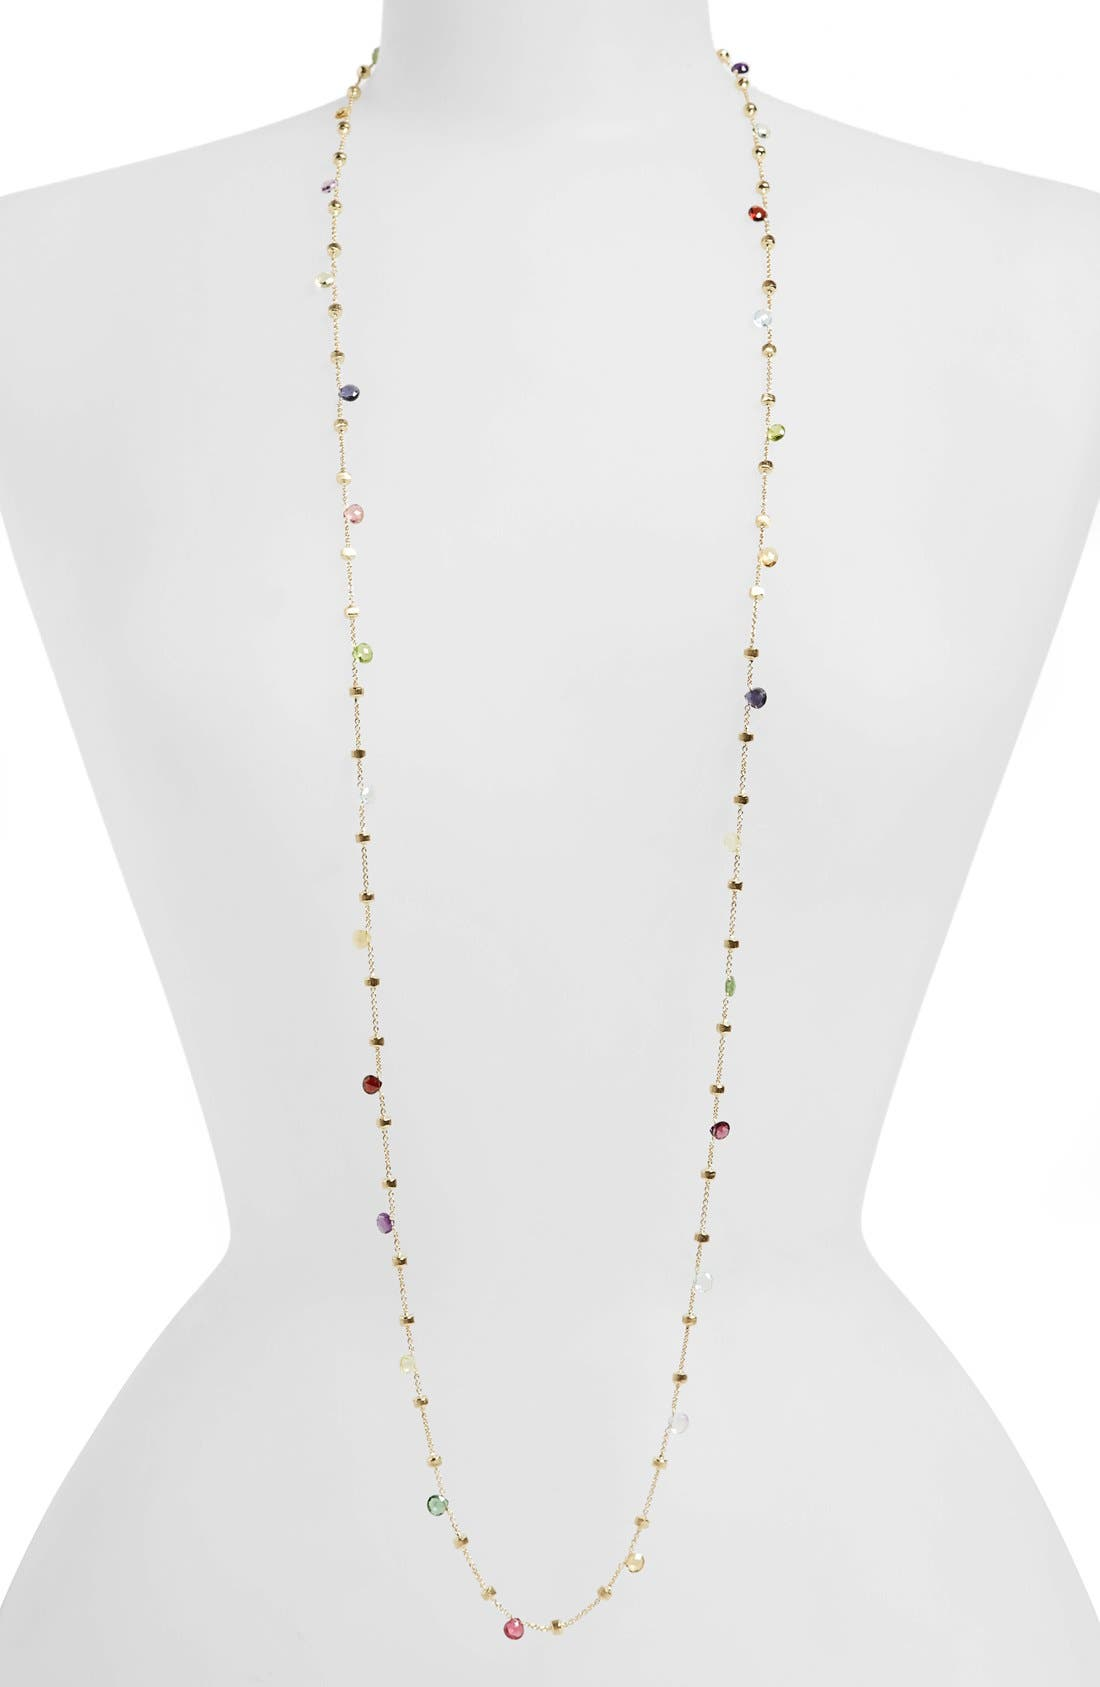 'Paradise' Semiprecious Stone Long Necklace,                         Main,                         color, Yellow Gold/ Multi